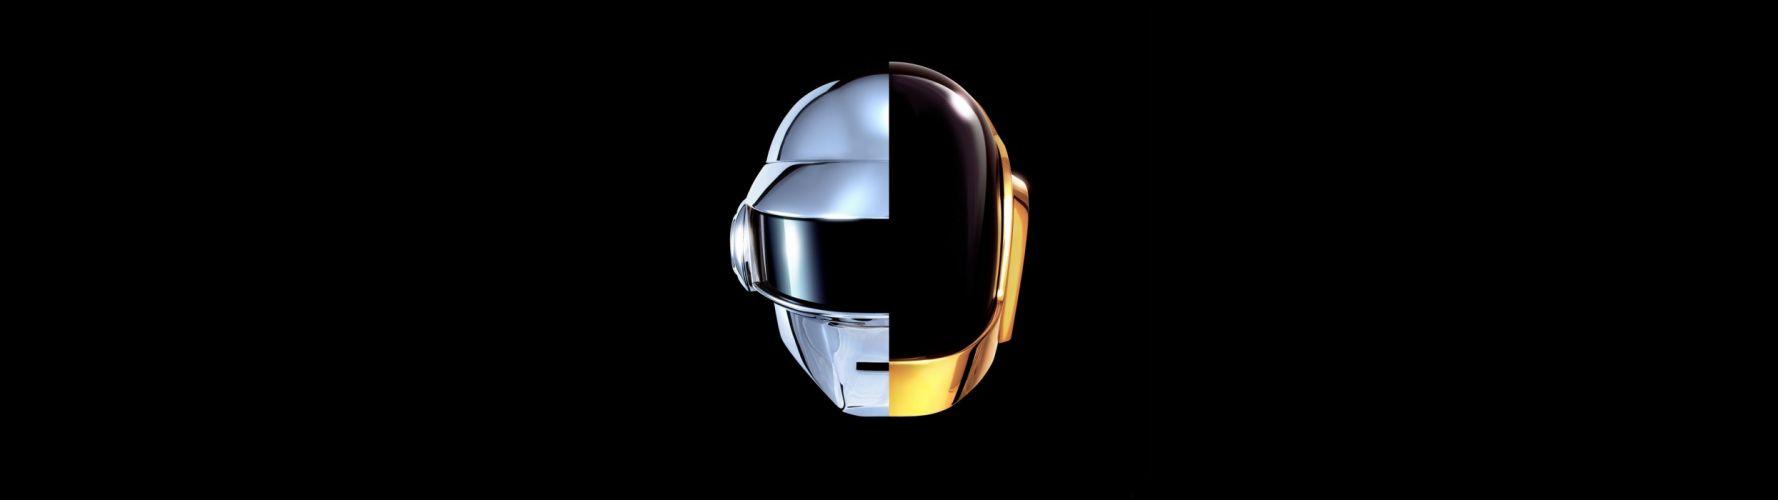 robots Daft Punk Thomas Bangalter guy manuel de homem christo wallpaper